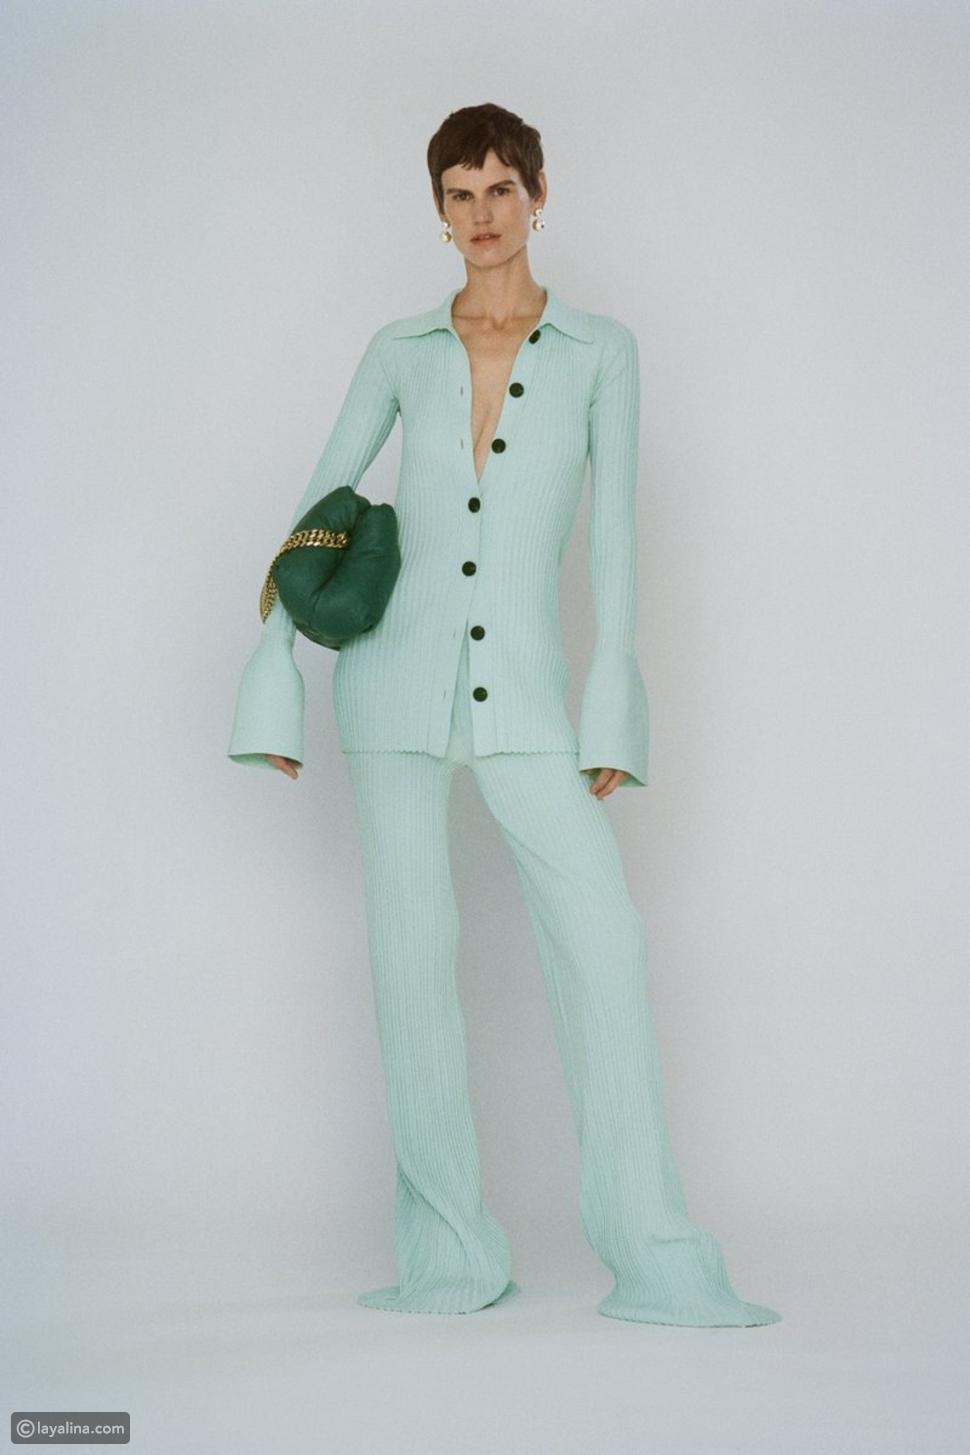 ملابسLoungewear بألوان مبهجة